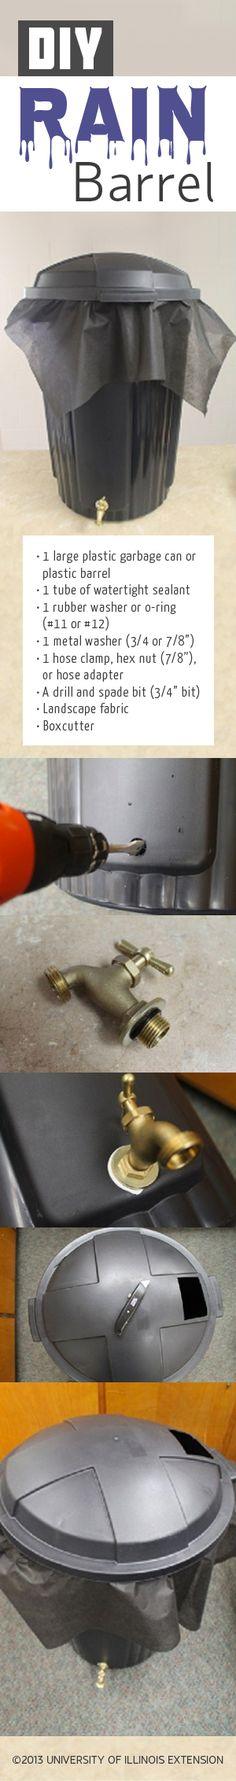 DIY: Make Your Own Rain Barrel